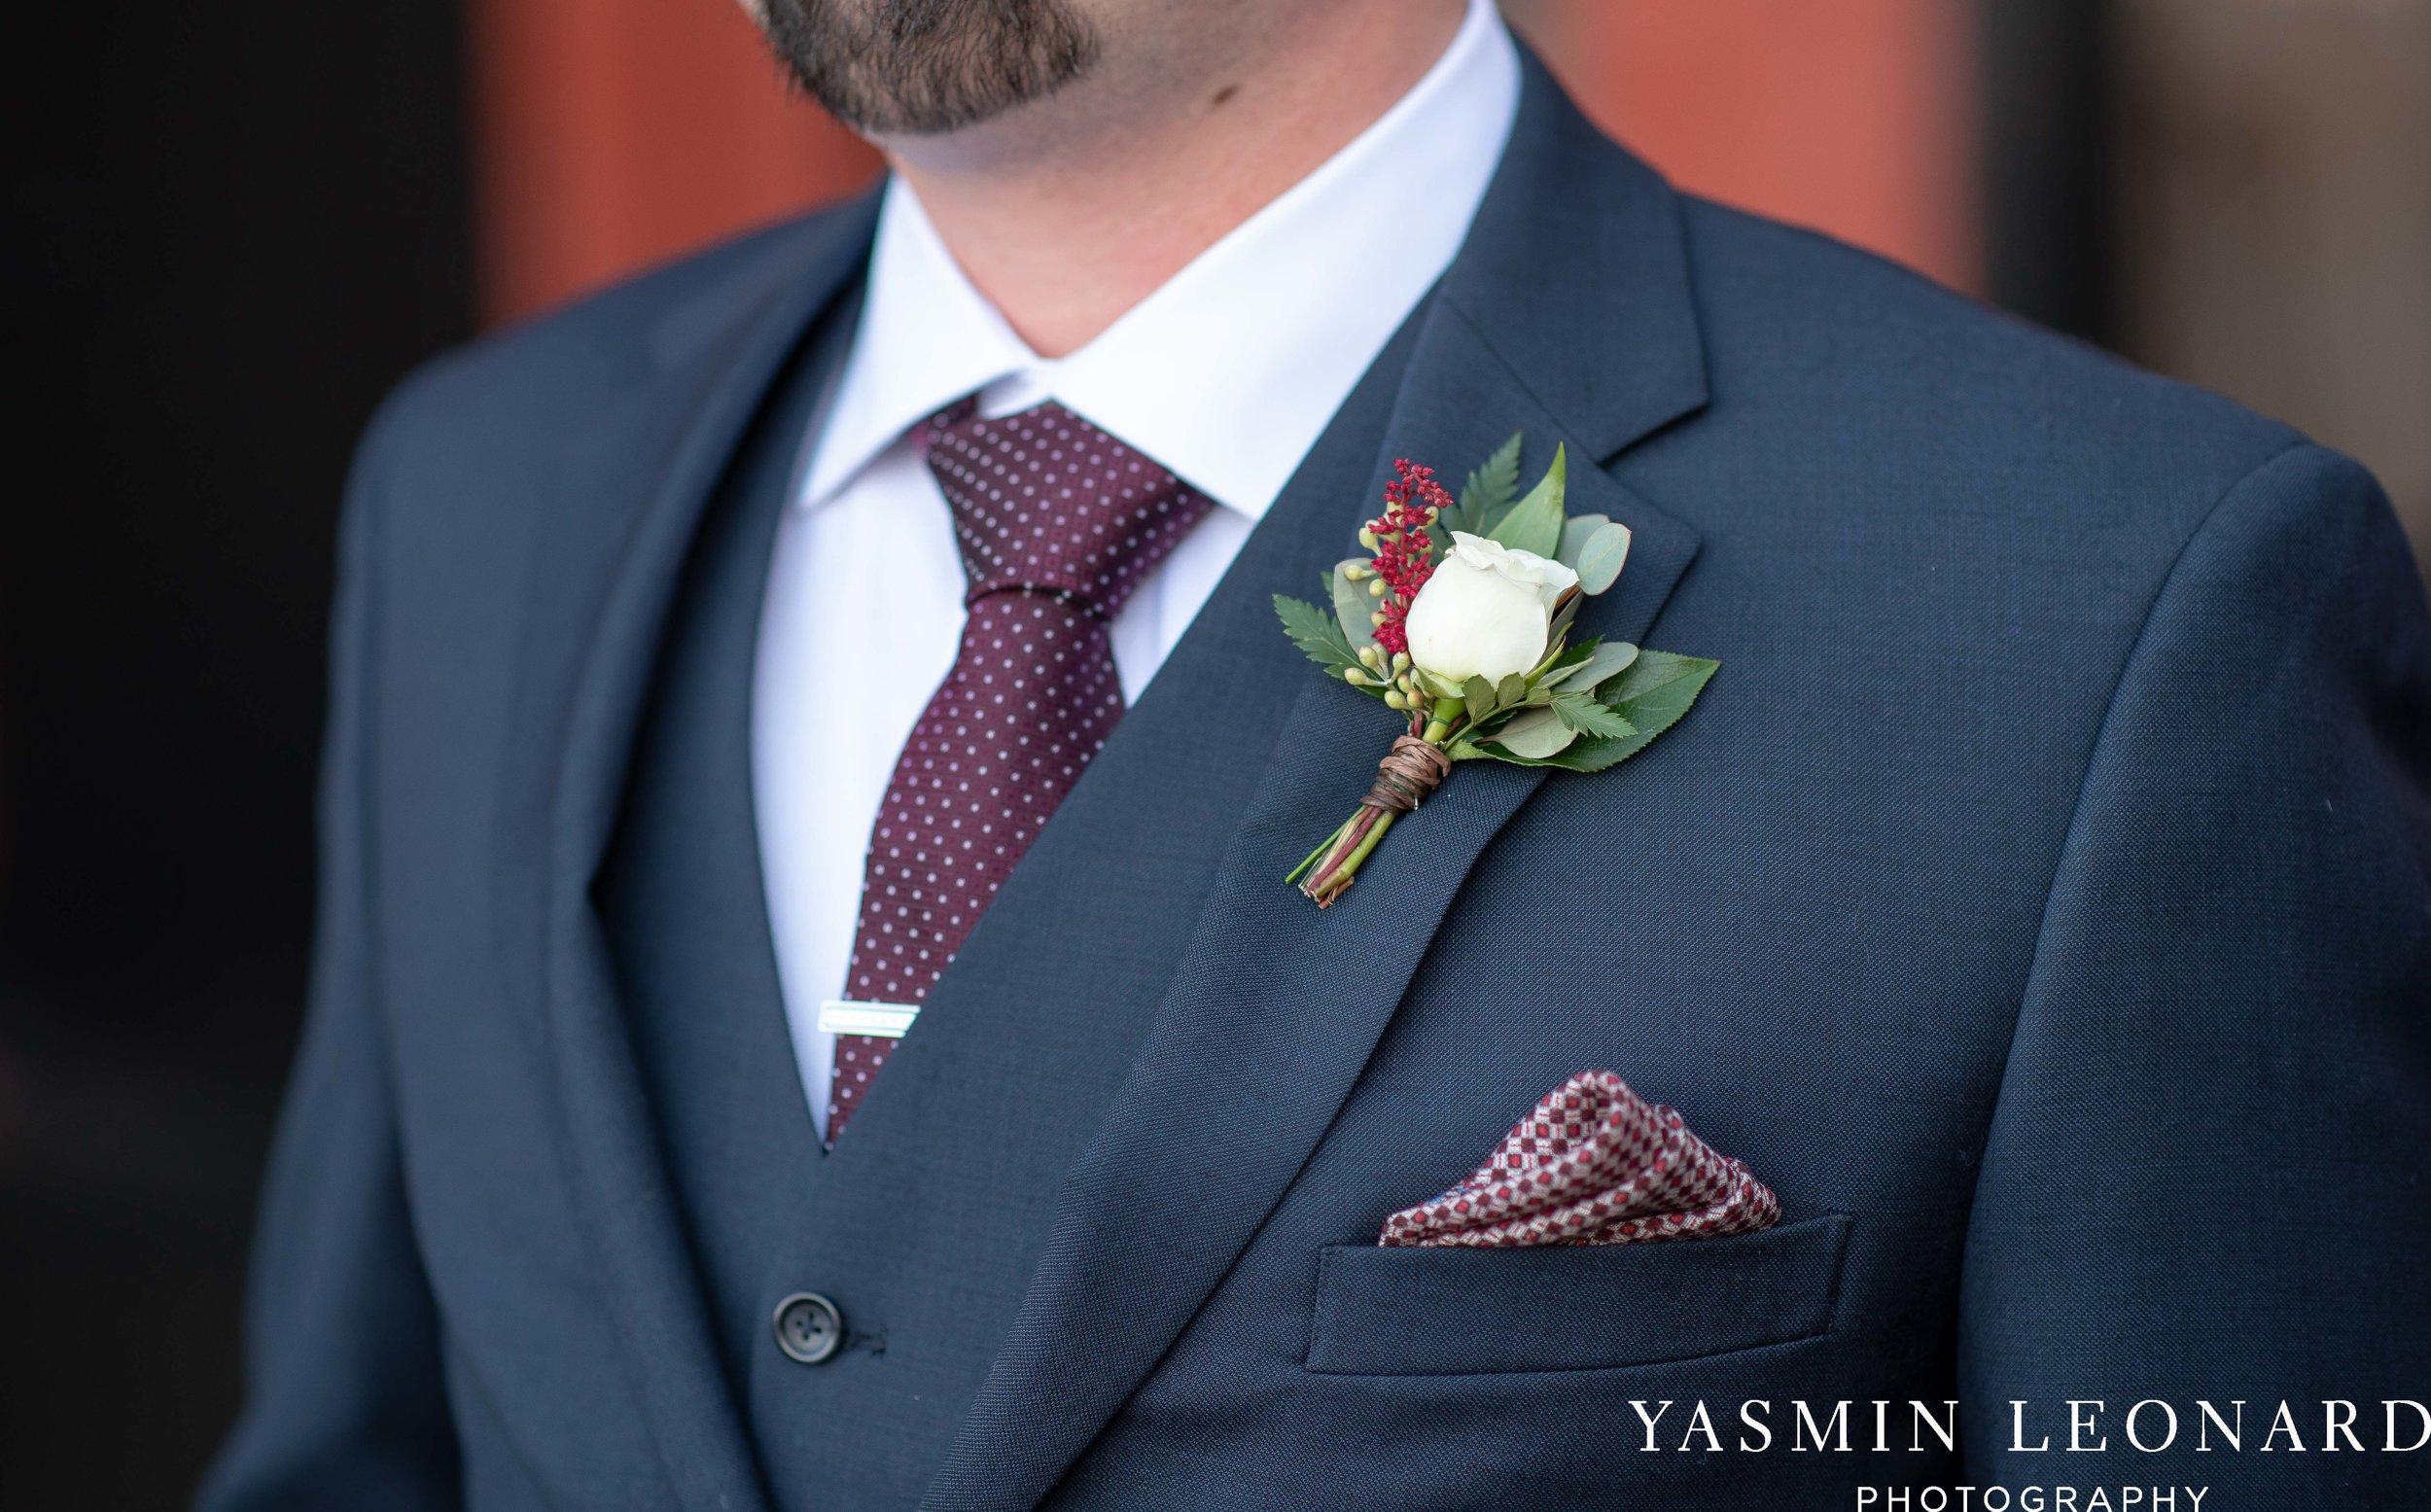 Rebekah and Matt - 105 Worth Event Centre - Yasmin Leonard Photography - Asheboro Wedding - NC Wedding - High Point Weddings - Triad Weddings - Winter Wedding-13.jpg